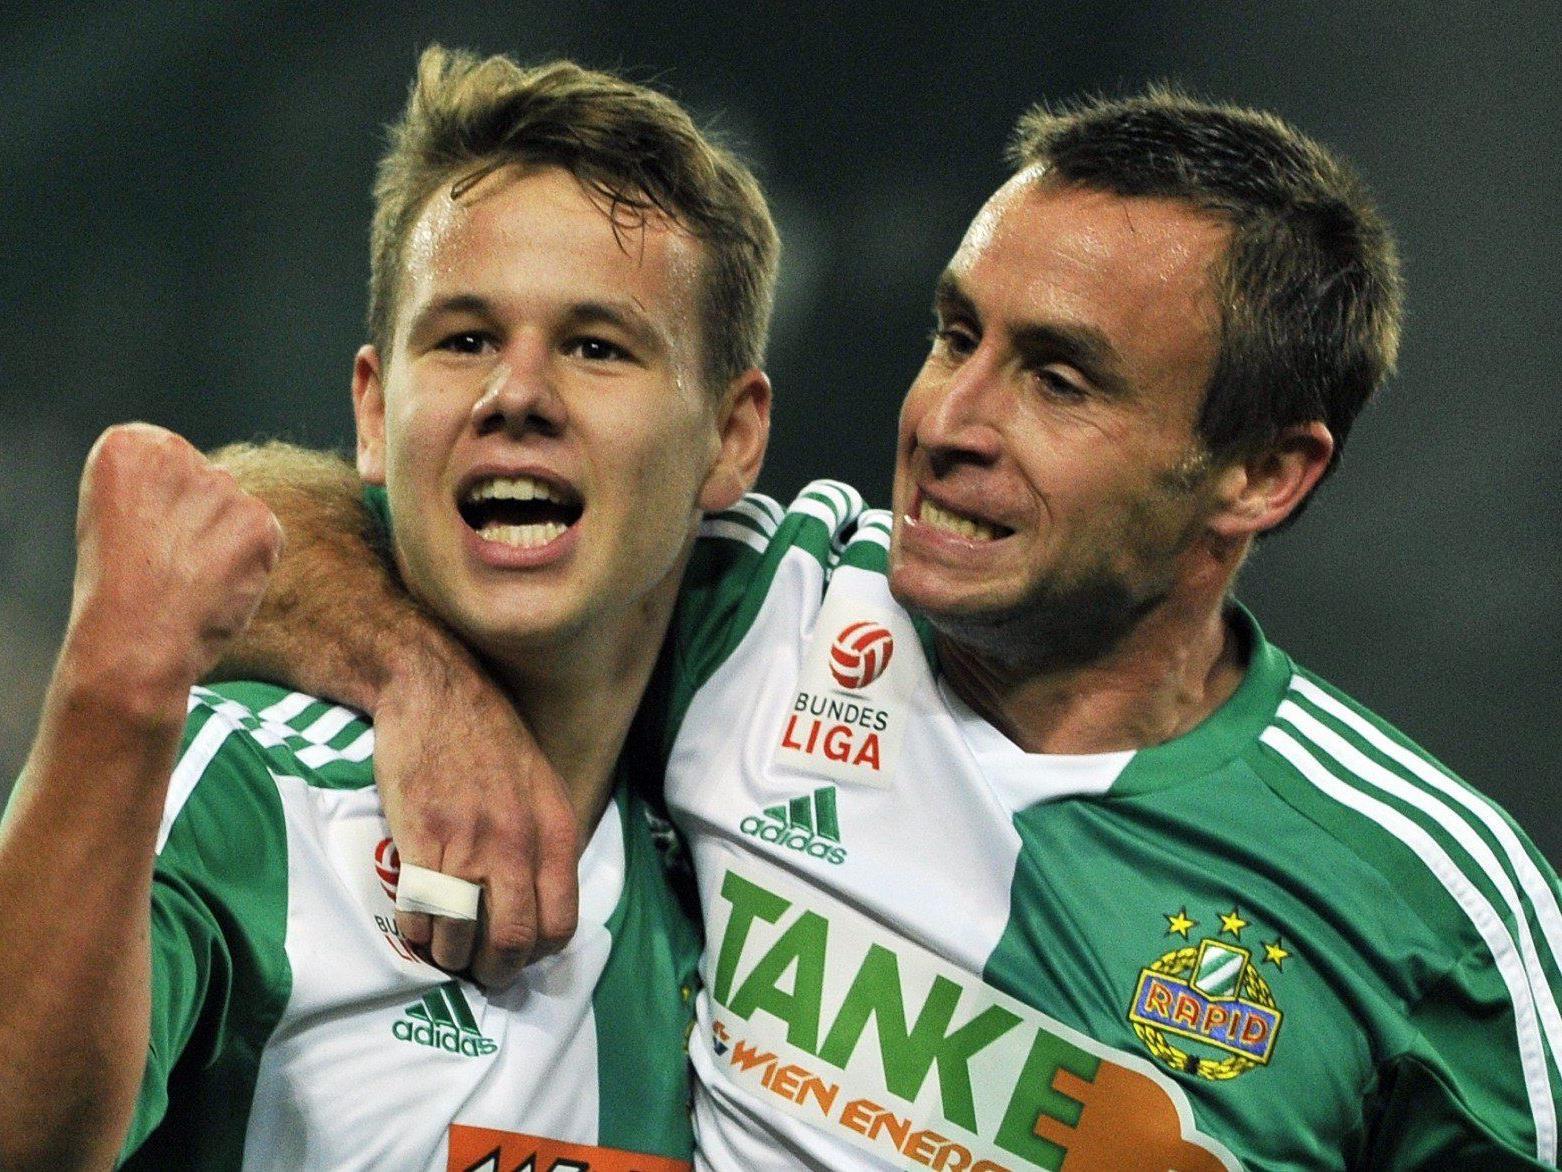 Am Dienstag trifft am Donnerstag im Europa League-Heimmatch auf Dynamo Kiew.